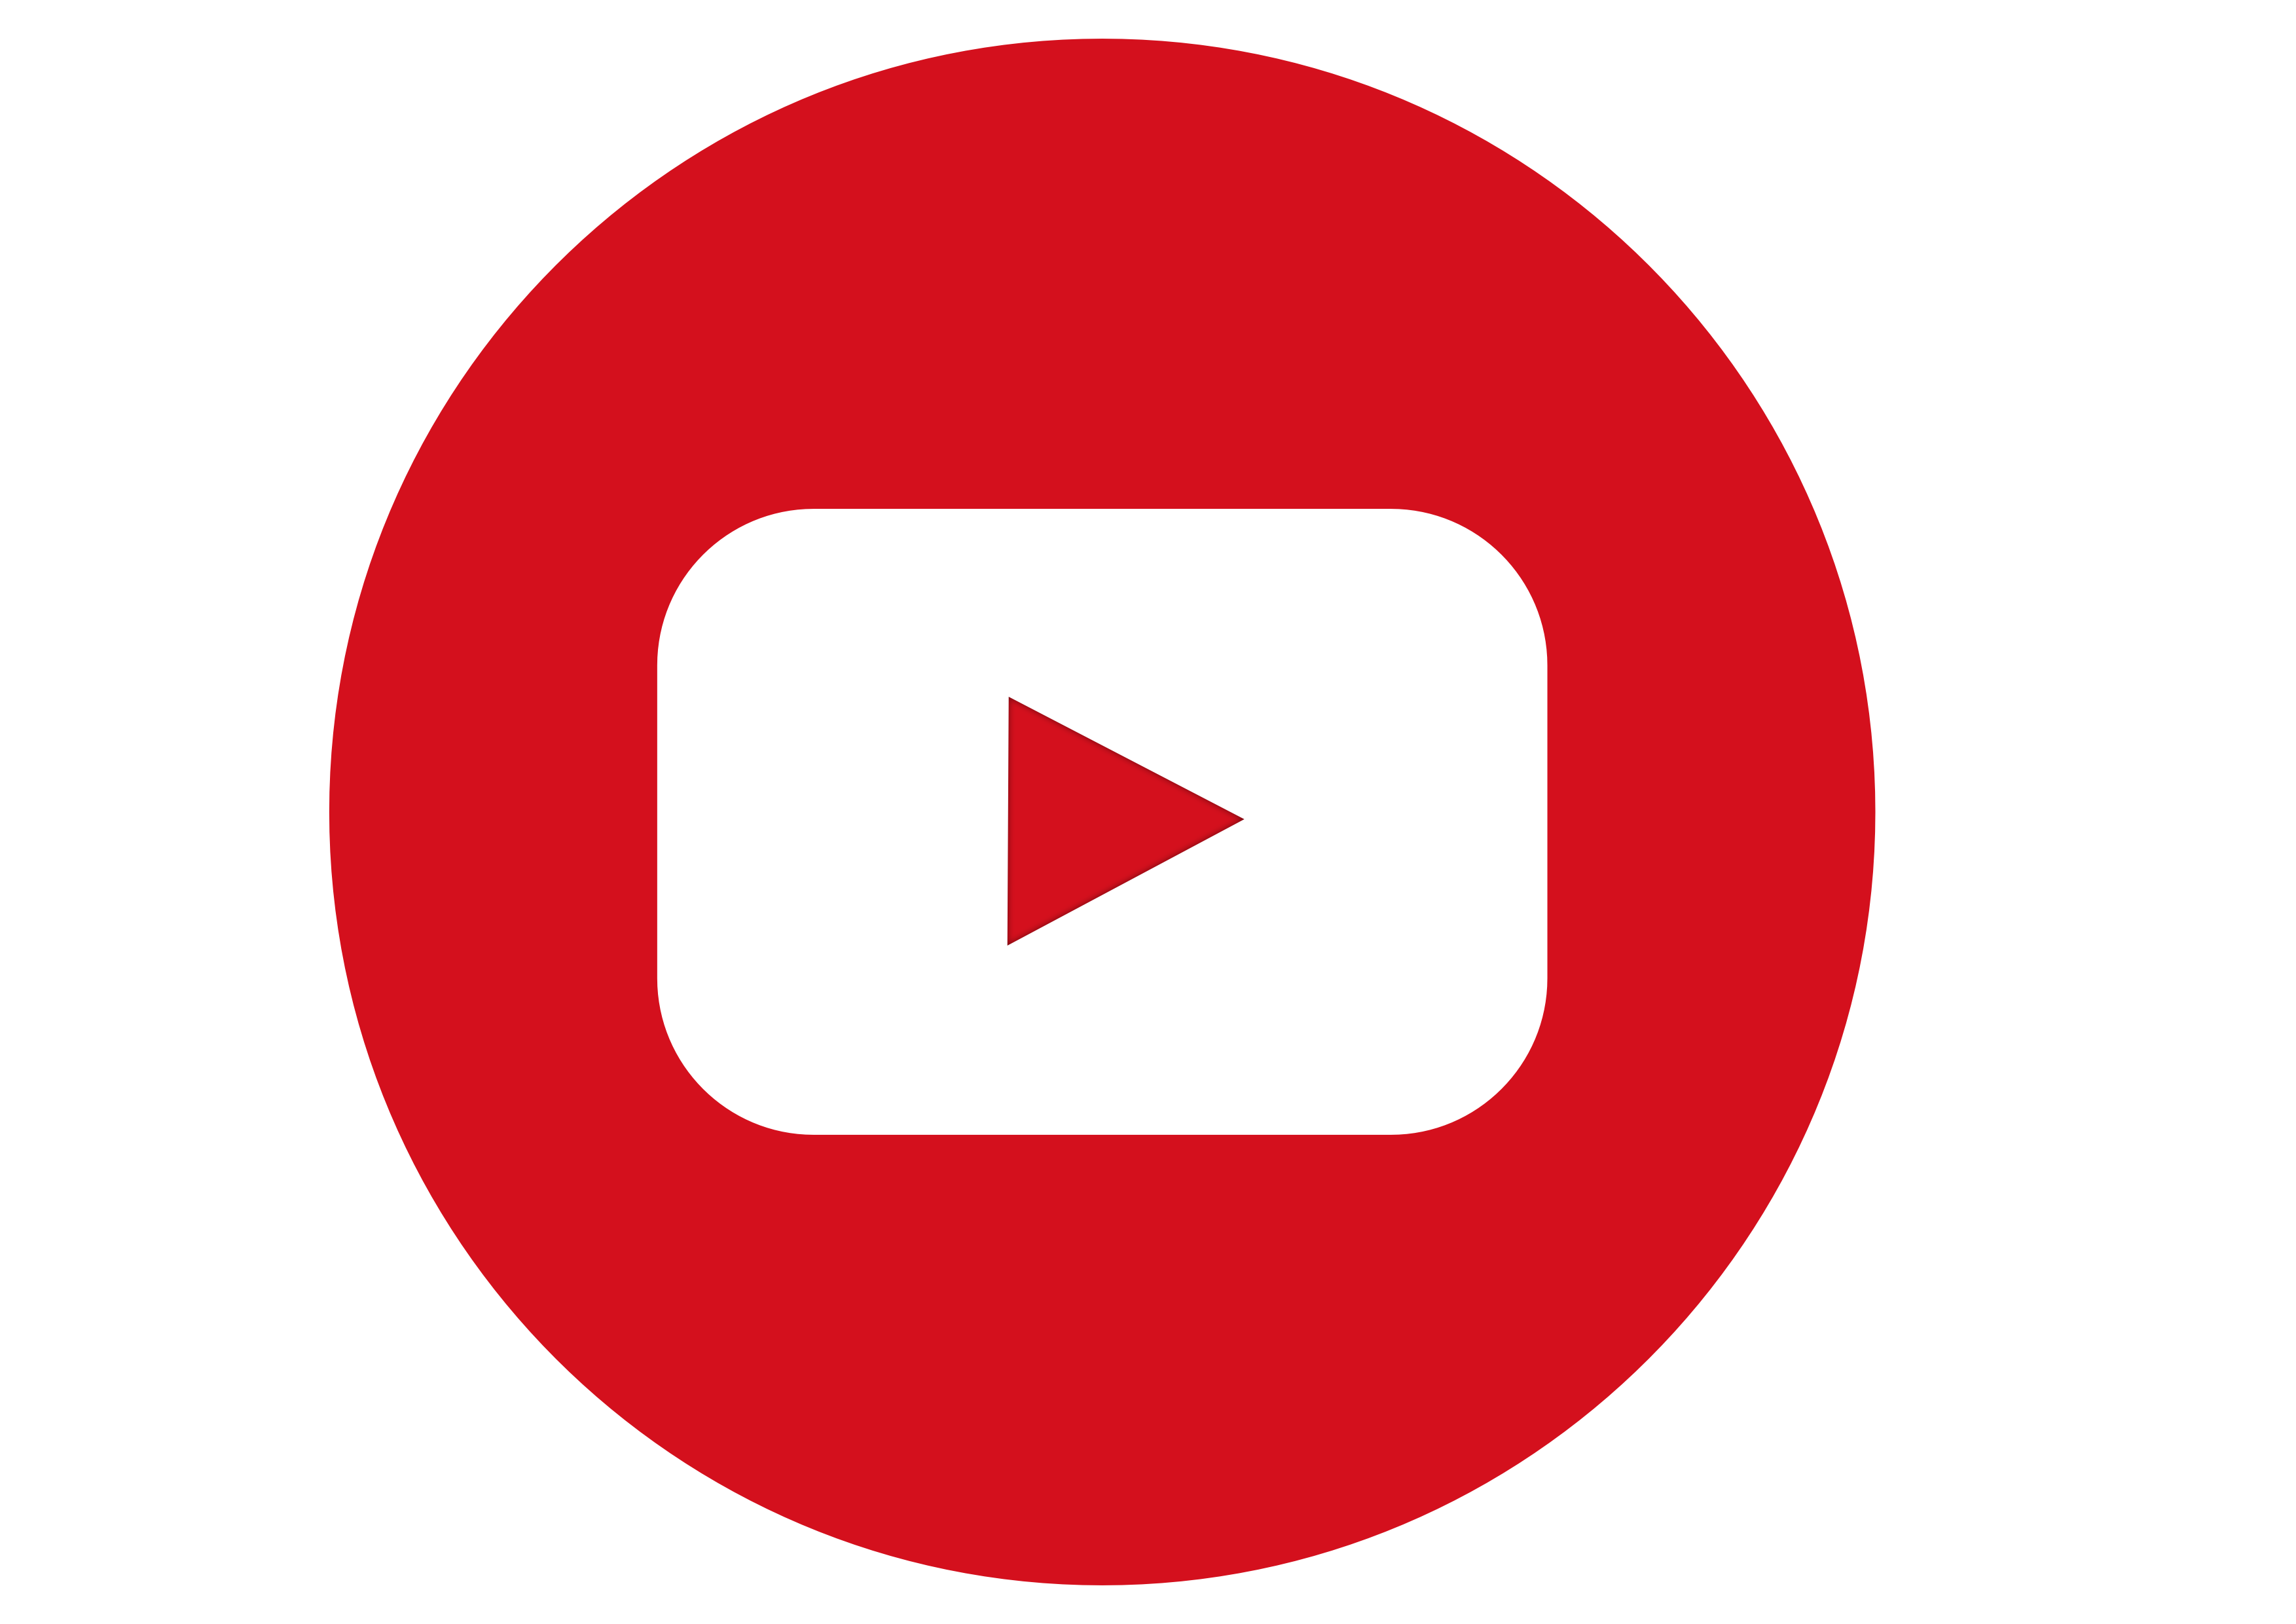 youtube logo icon transparent in 2019.